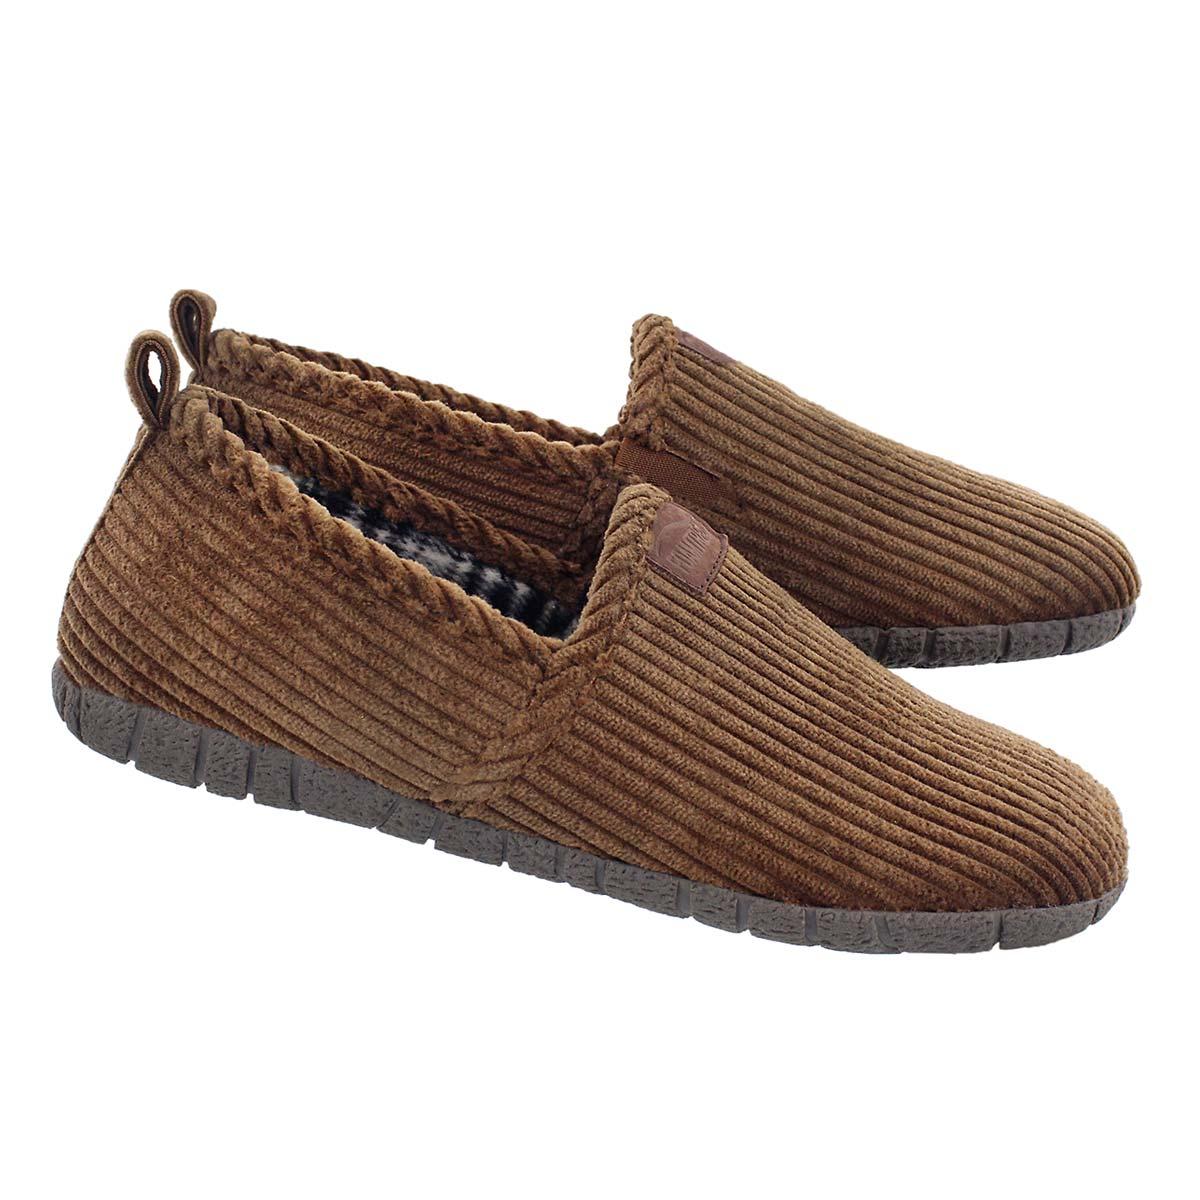 Mns Milton brown closed back slipper